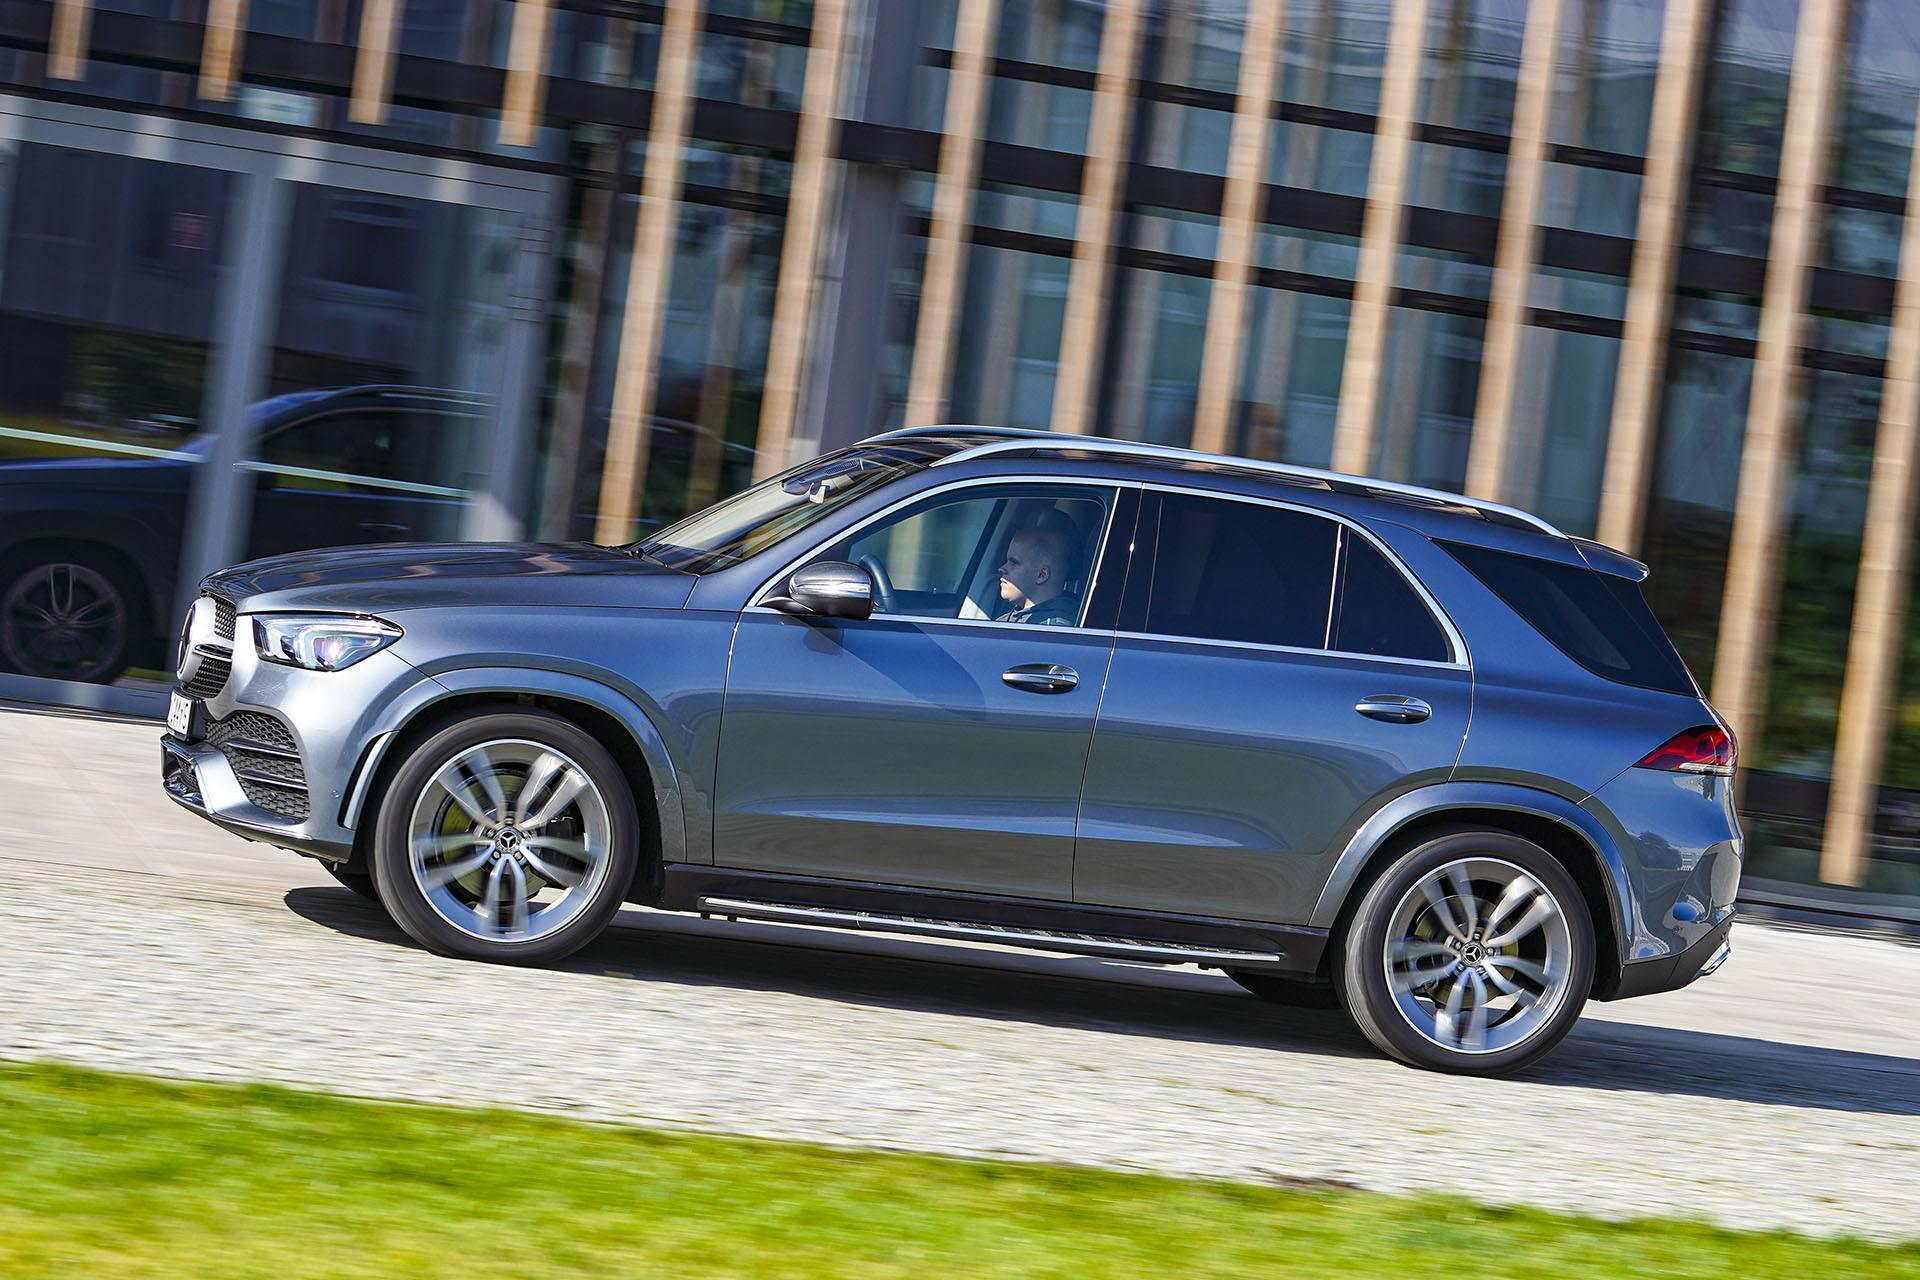 Mercedes GLE - bok - Land Rover Discovery, Mercedes GLE, Range Rover Sport, Volkswagen Touareg, Volvo XC90 – PORÓWNANIE –opinie, dane techniczne, wymiary